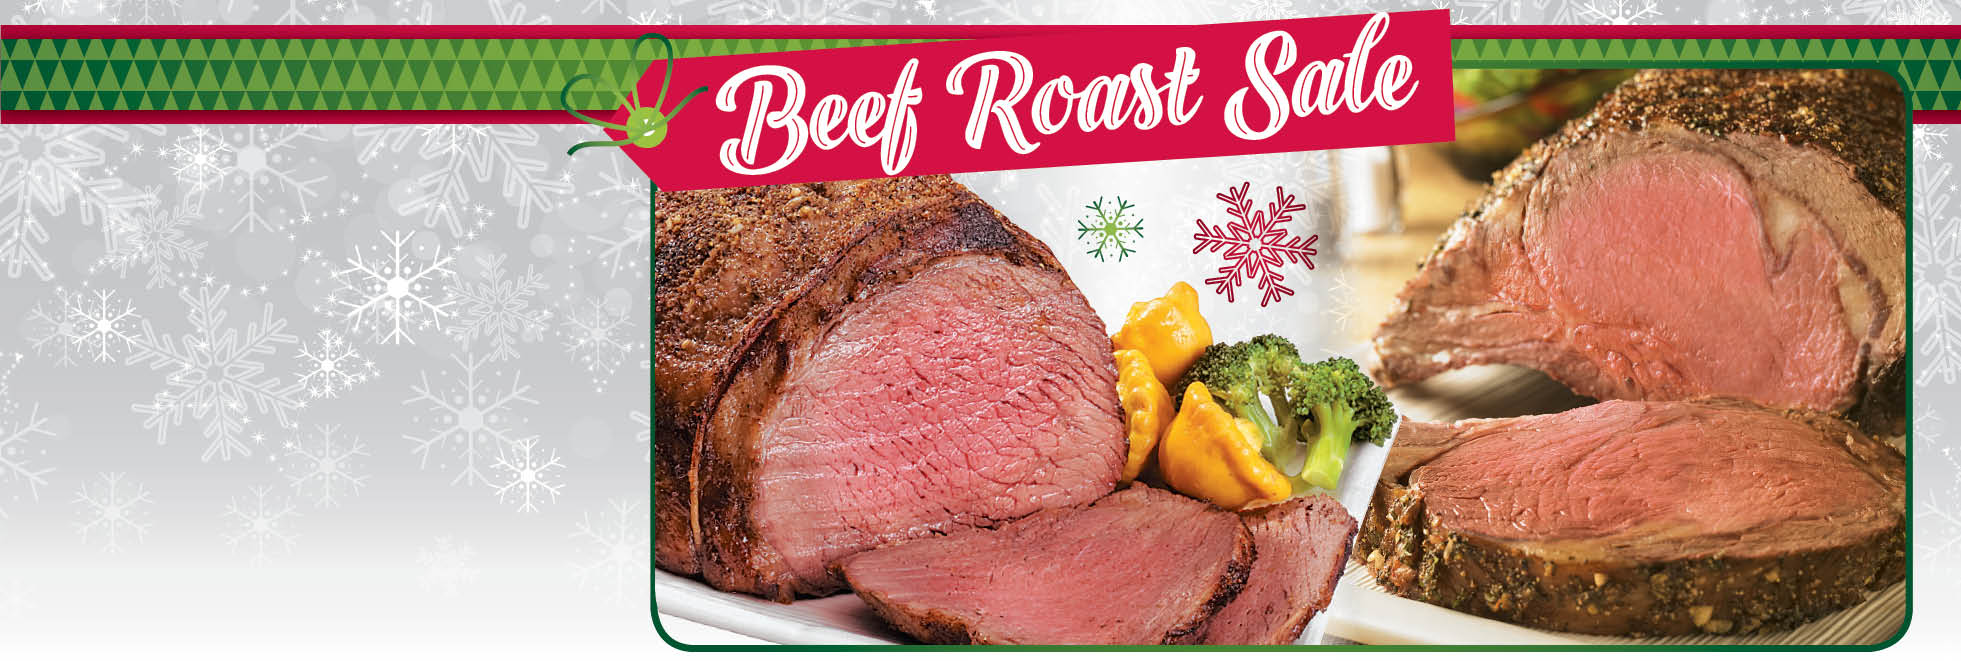 Beef Roast Sale